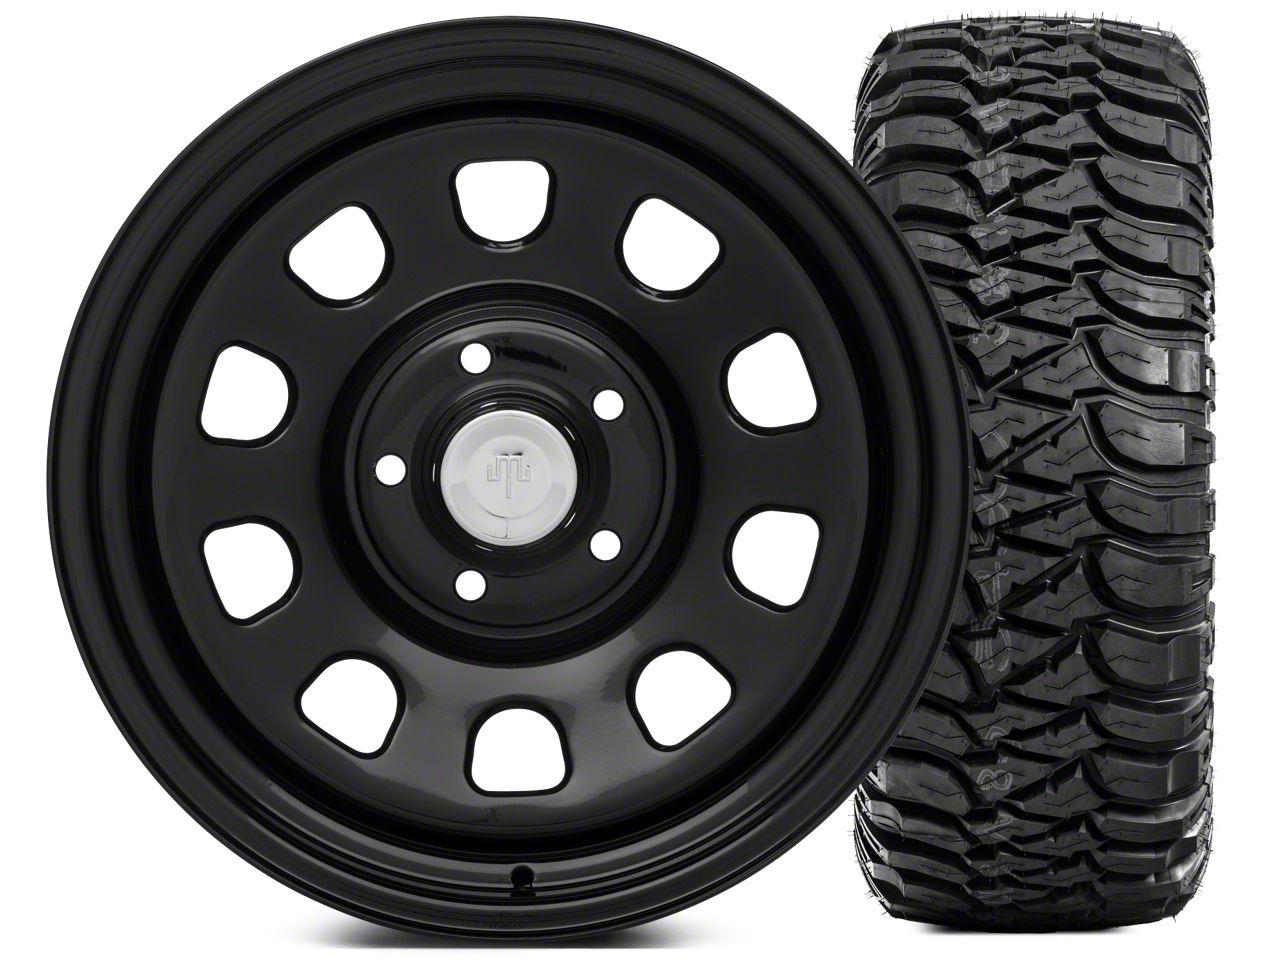 Mammoth D Window Steel 17x9 Wheel and Mickey Thompson Baja MTZ 305/65-17 Tire Kit (07-18 Jeep Wrangler JK)